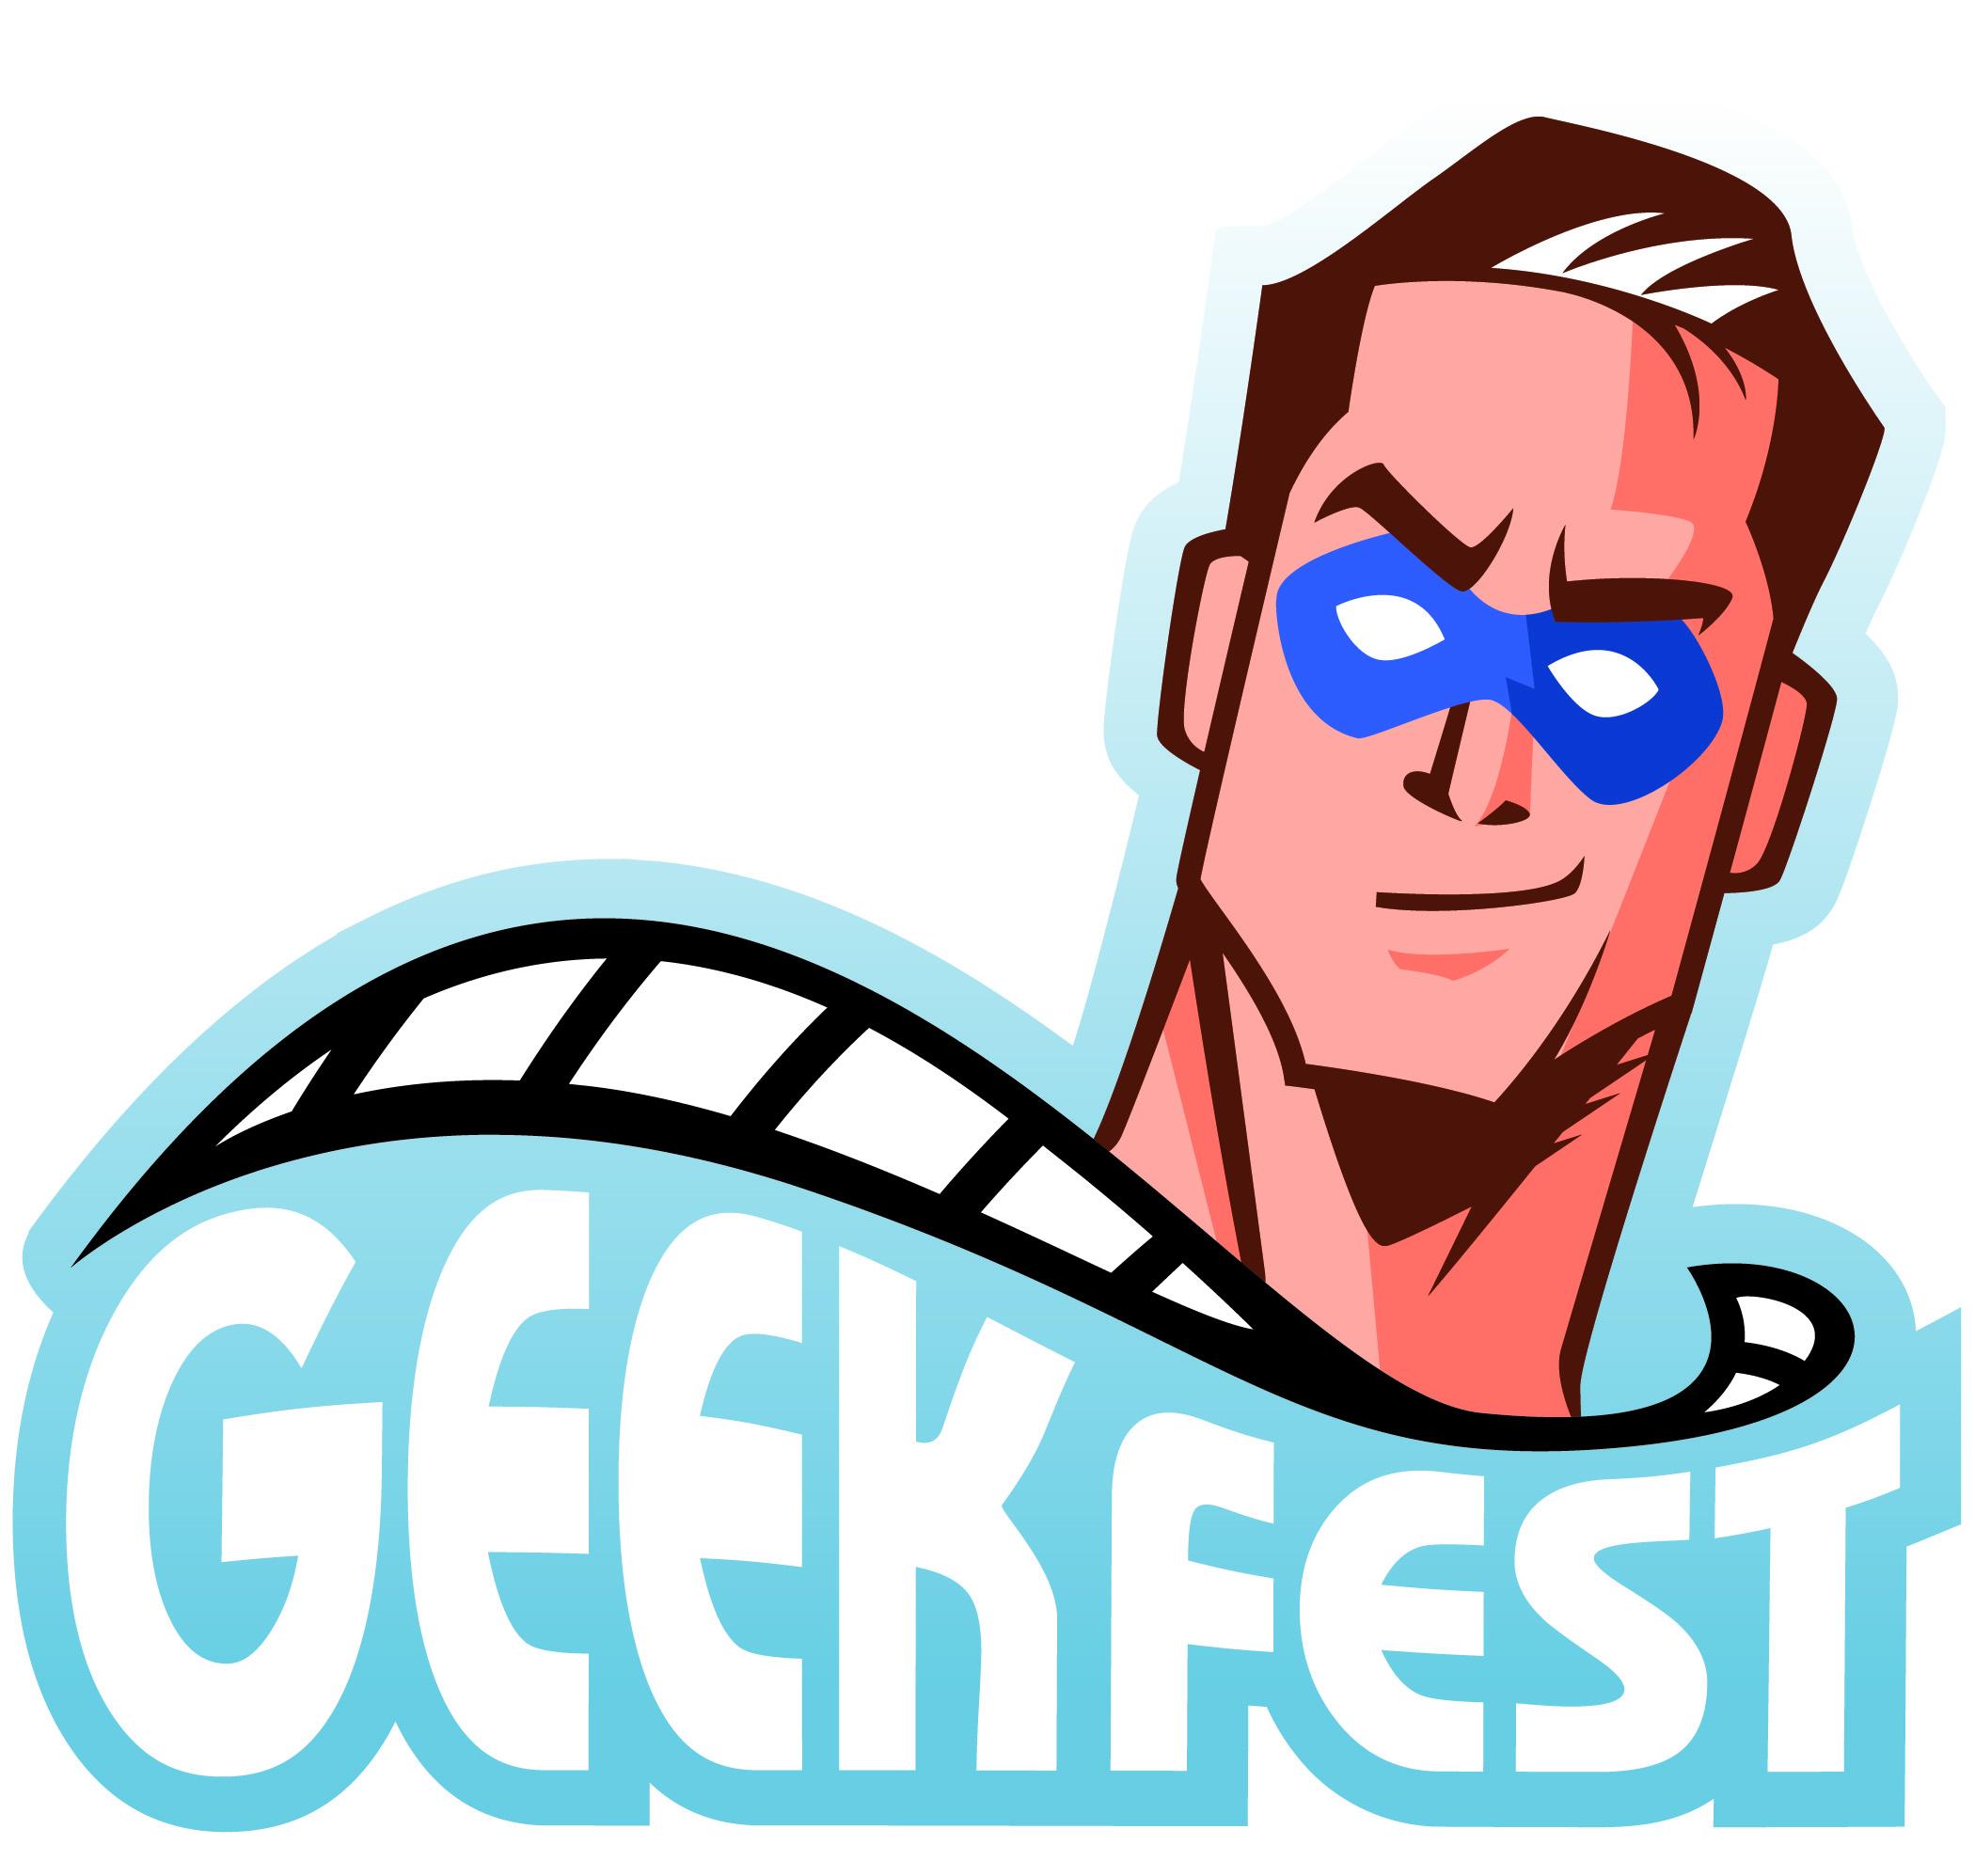 geekfest-logos.jpg